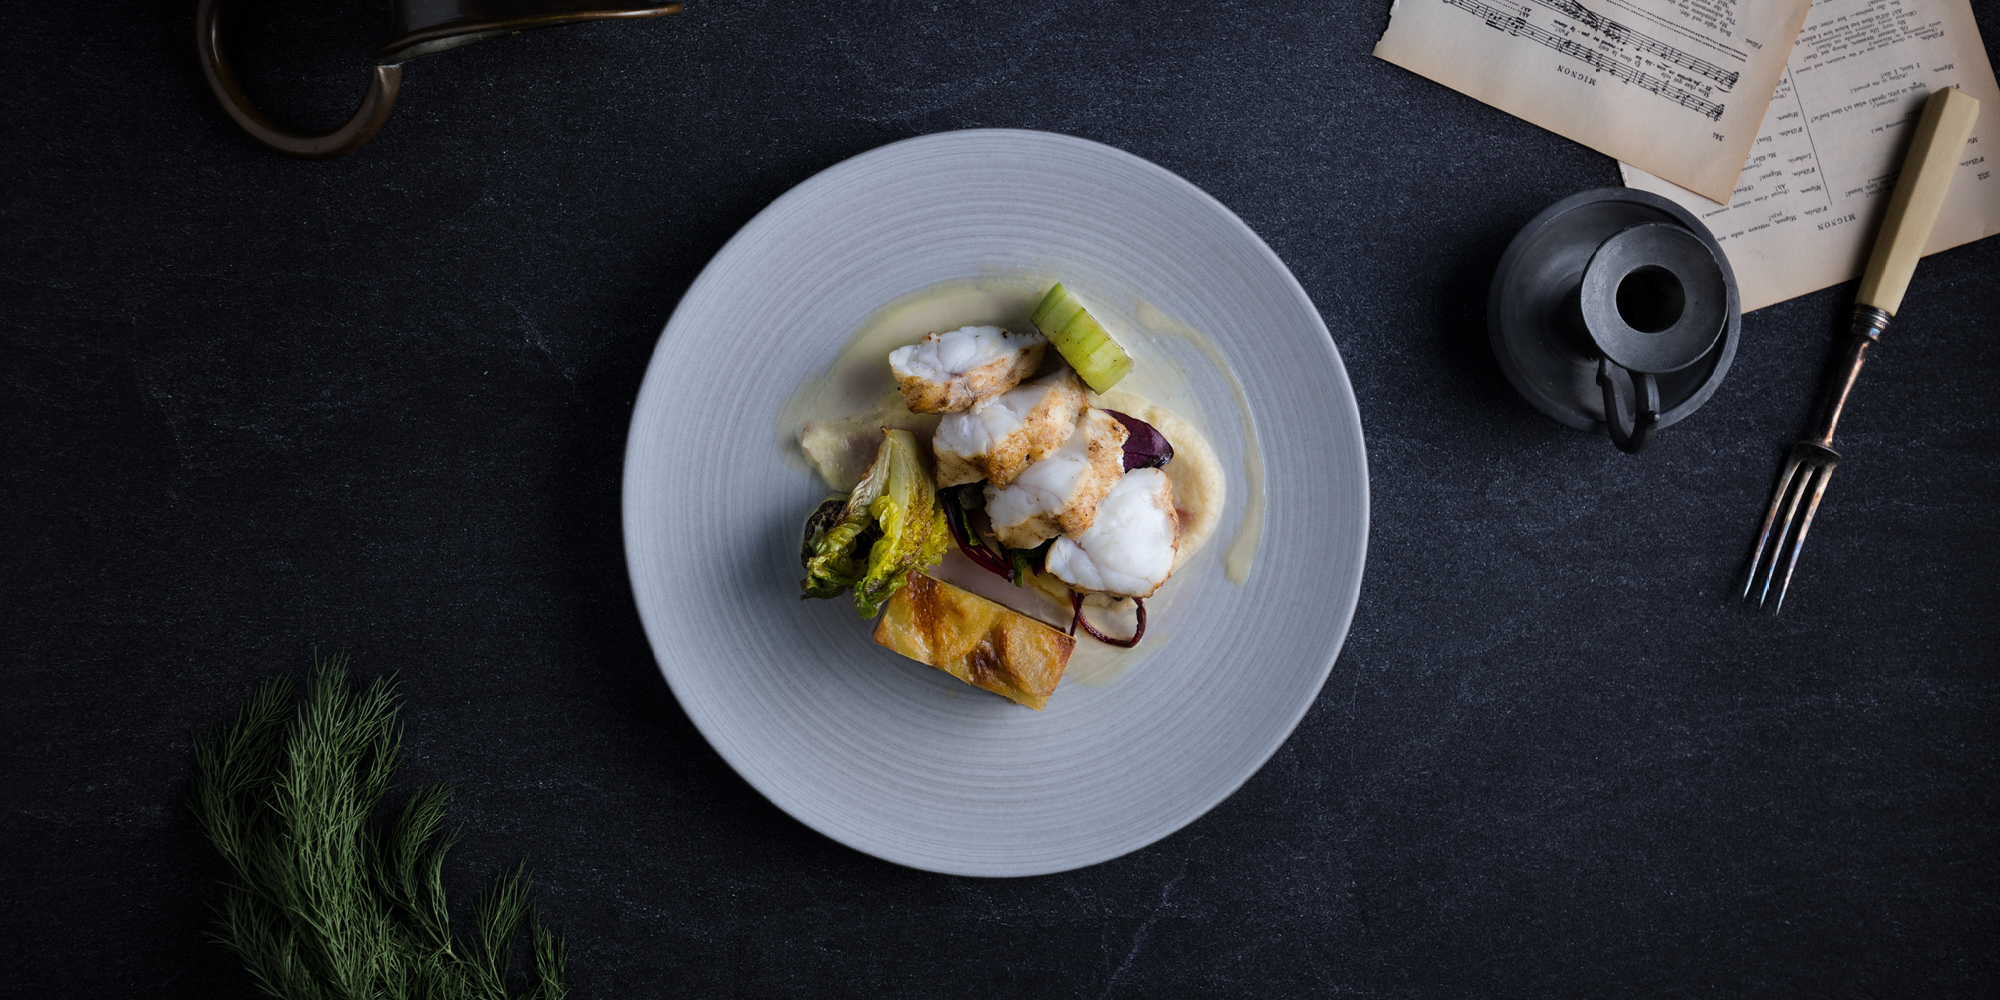 The Grahamston I Scottish Monkfish served with celeriac, truffle pomme Anna, burnt cucmber & lemon butter sauce